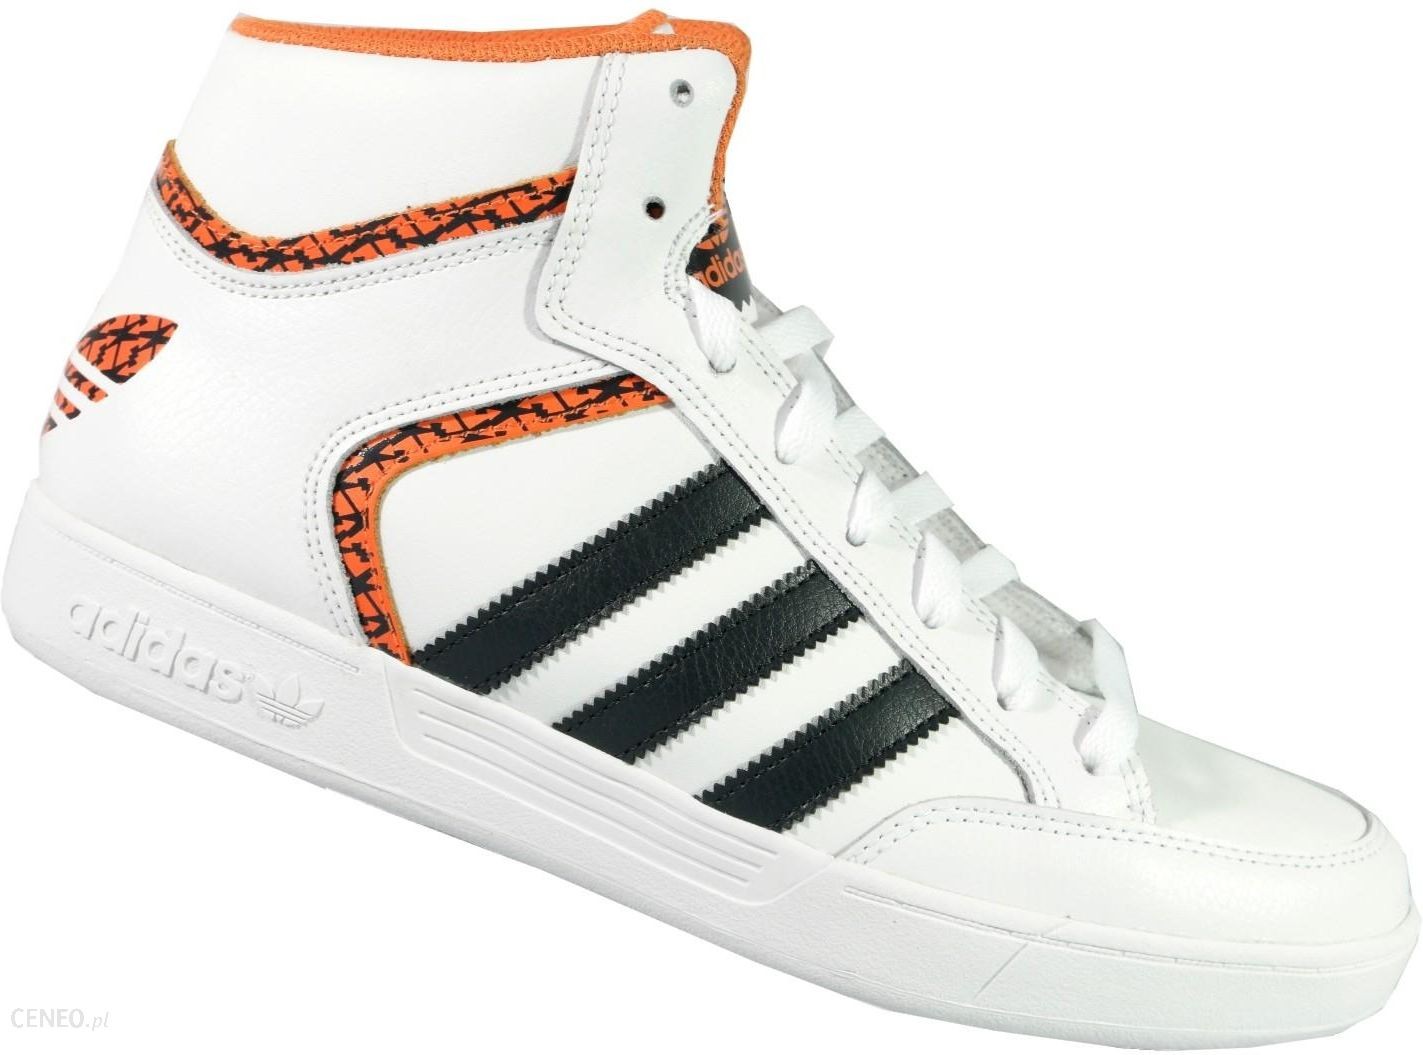 Adidas Varial MID CQ1148 rozmiar 41,3 Ceny i opinie Ceneo.pl